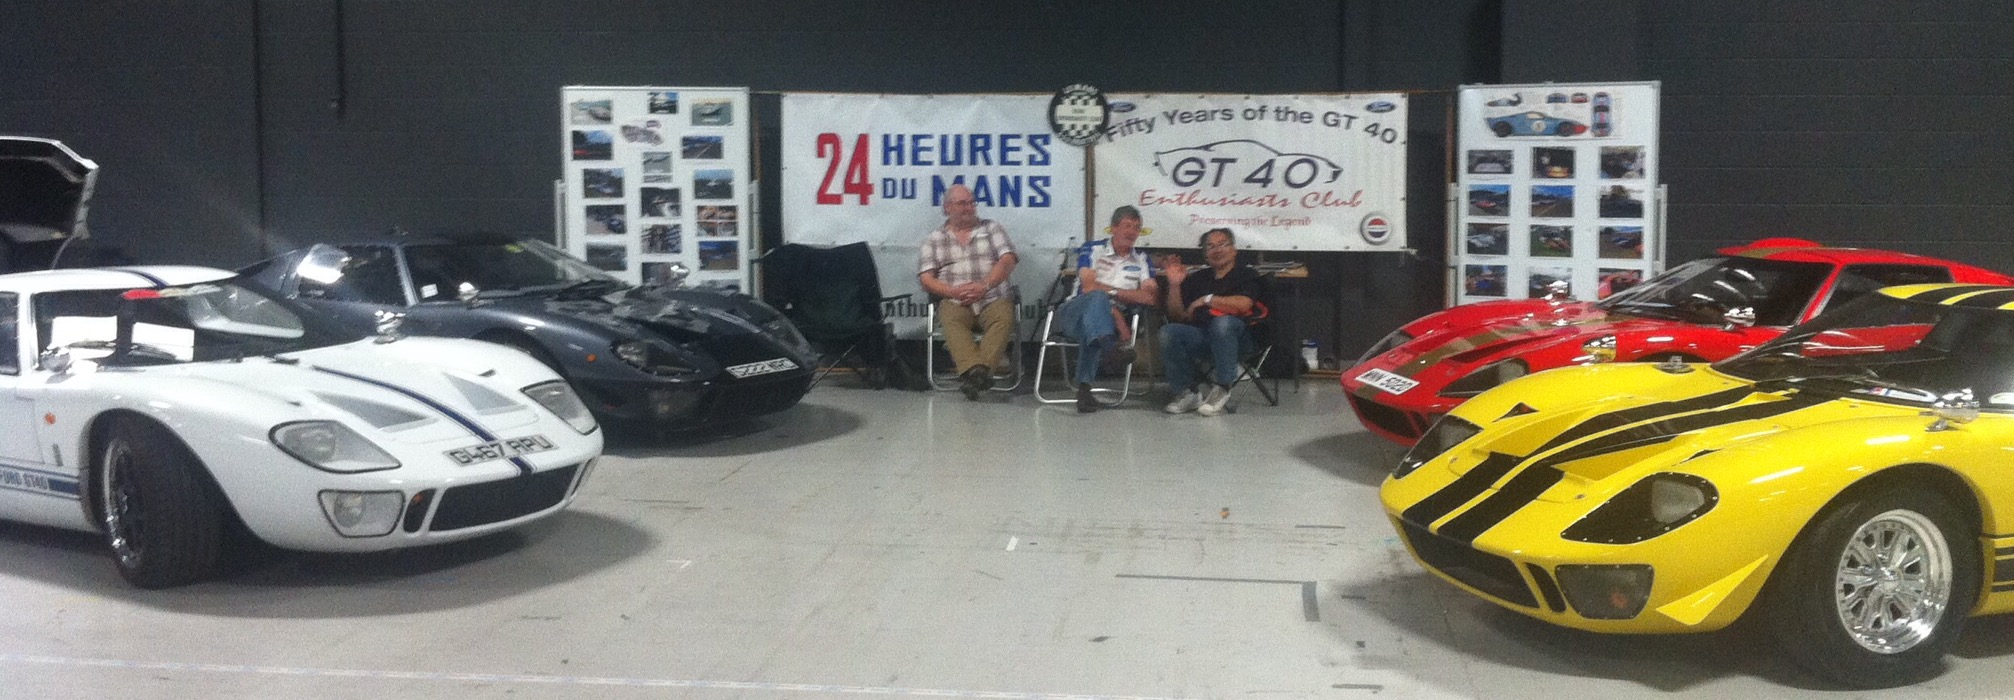 F J Classic car show Manchester.-image-jpeg